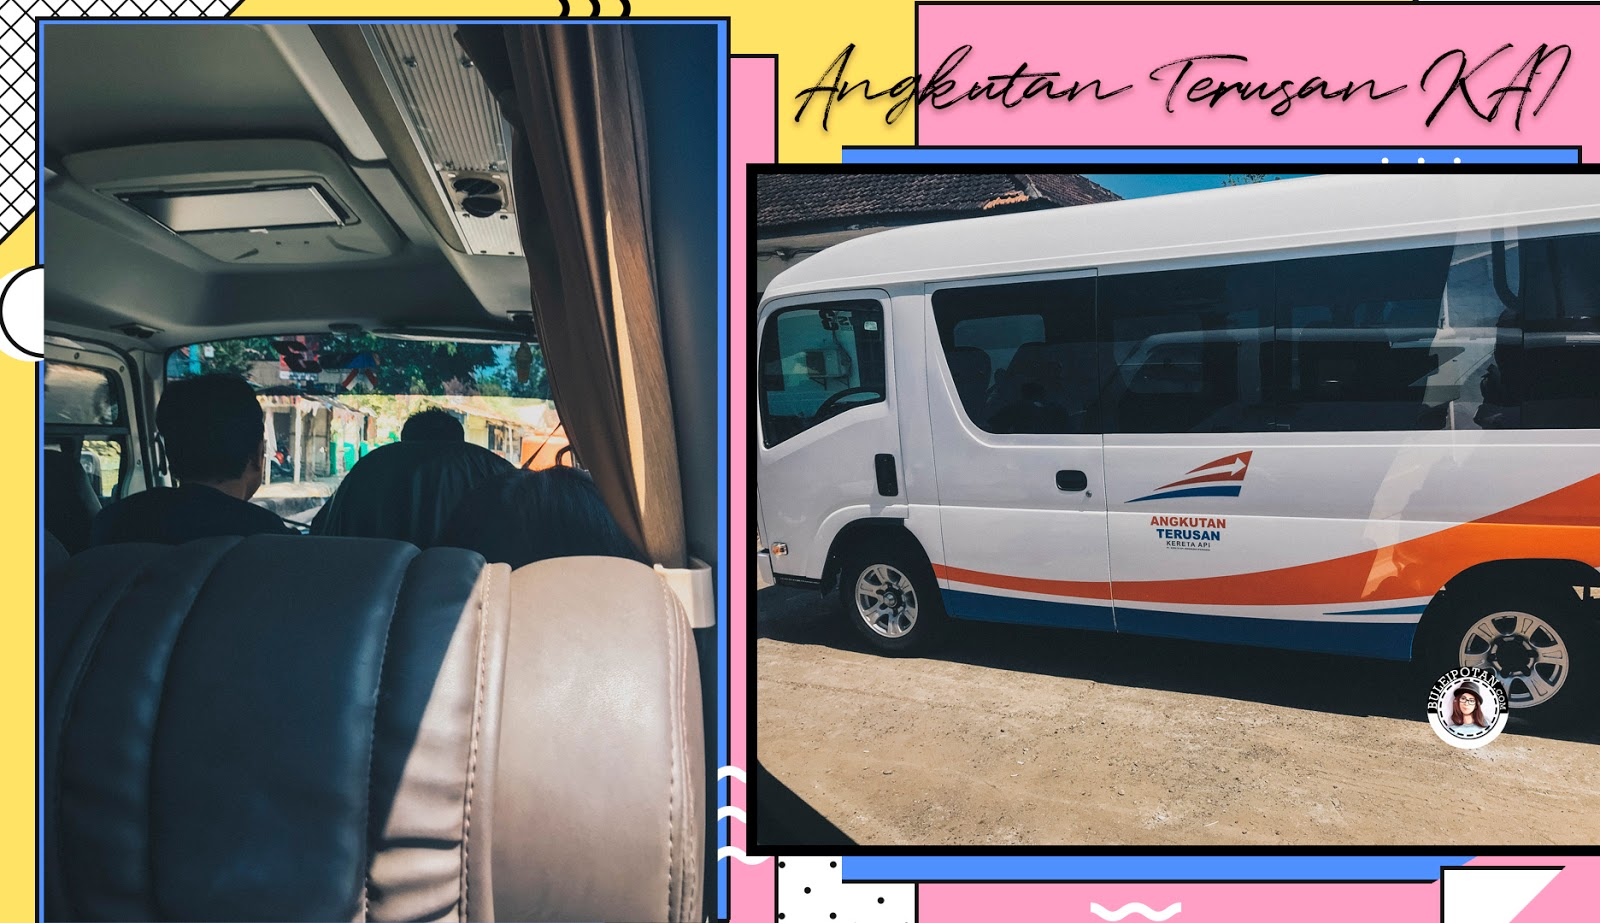 wisata+lengkap+ke+dieng+banjarnegara